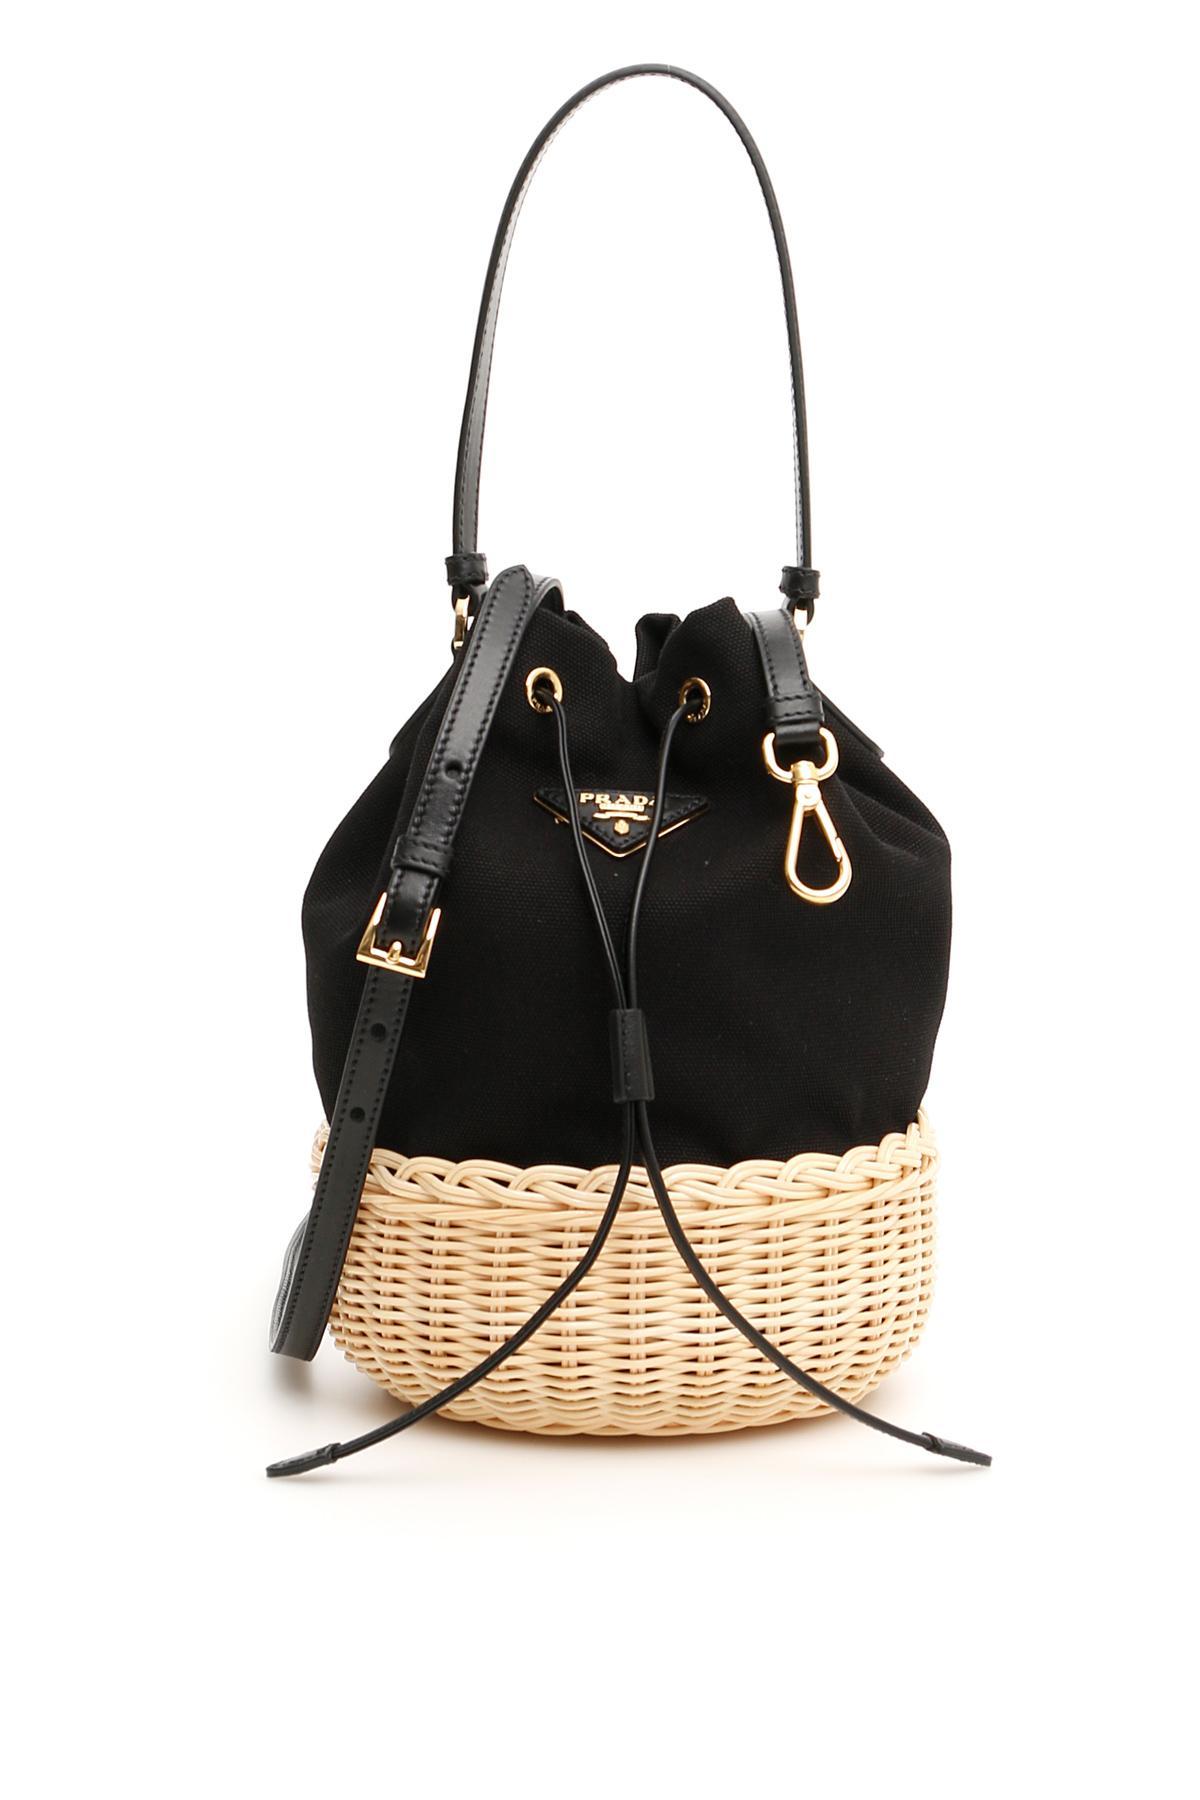 4a287ced26 Lyst - Prada Hemp Mini Bucket Bag in Black